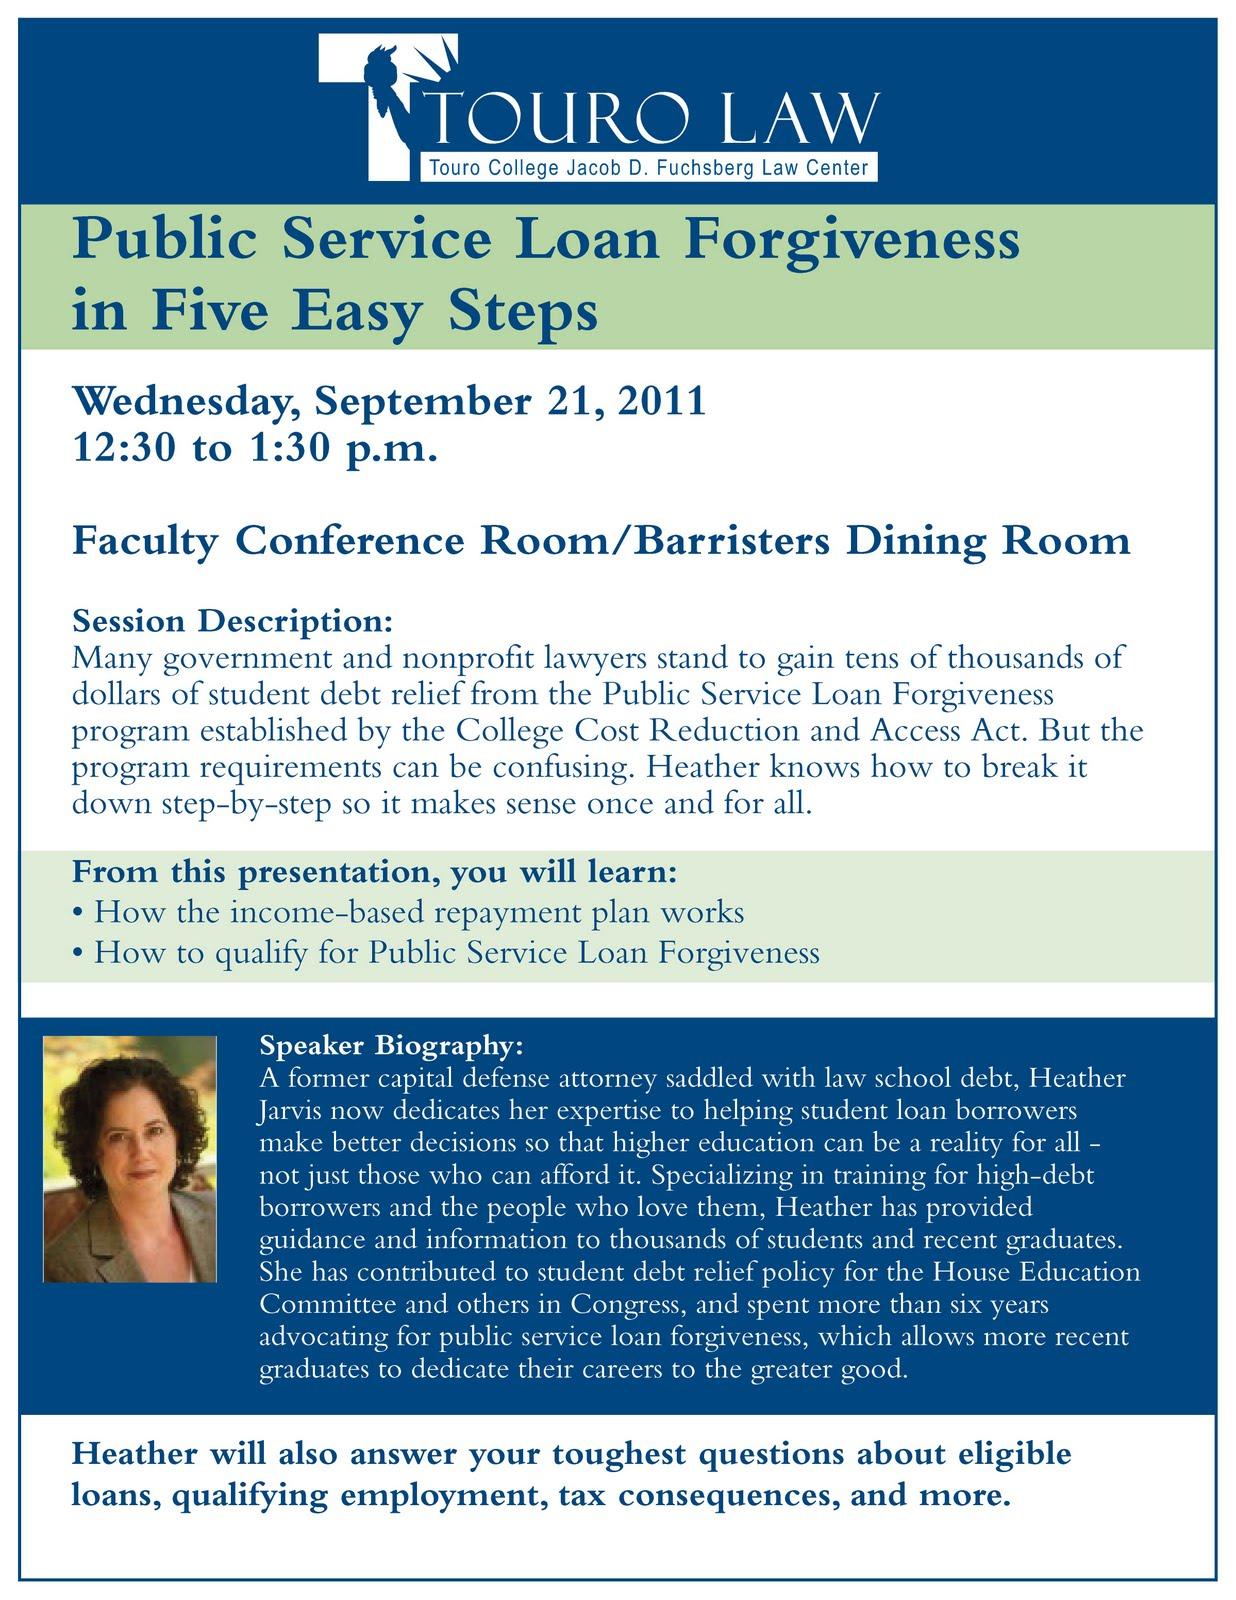 Touro Law CenterCareer Services Office Blog: Program: Public Service Loan Forgiveness in Five ...